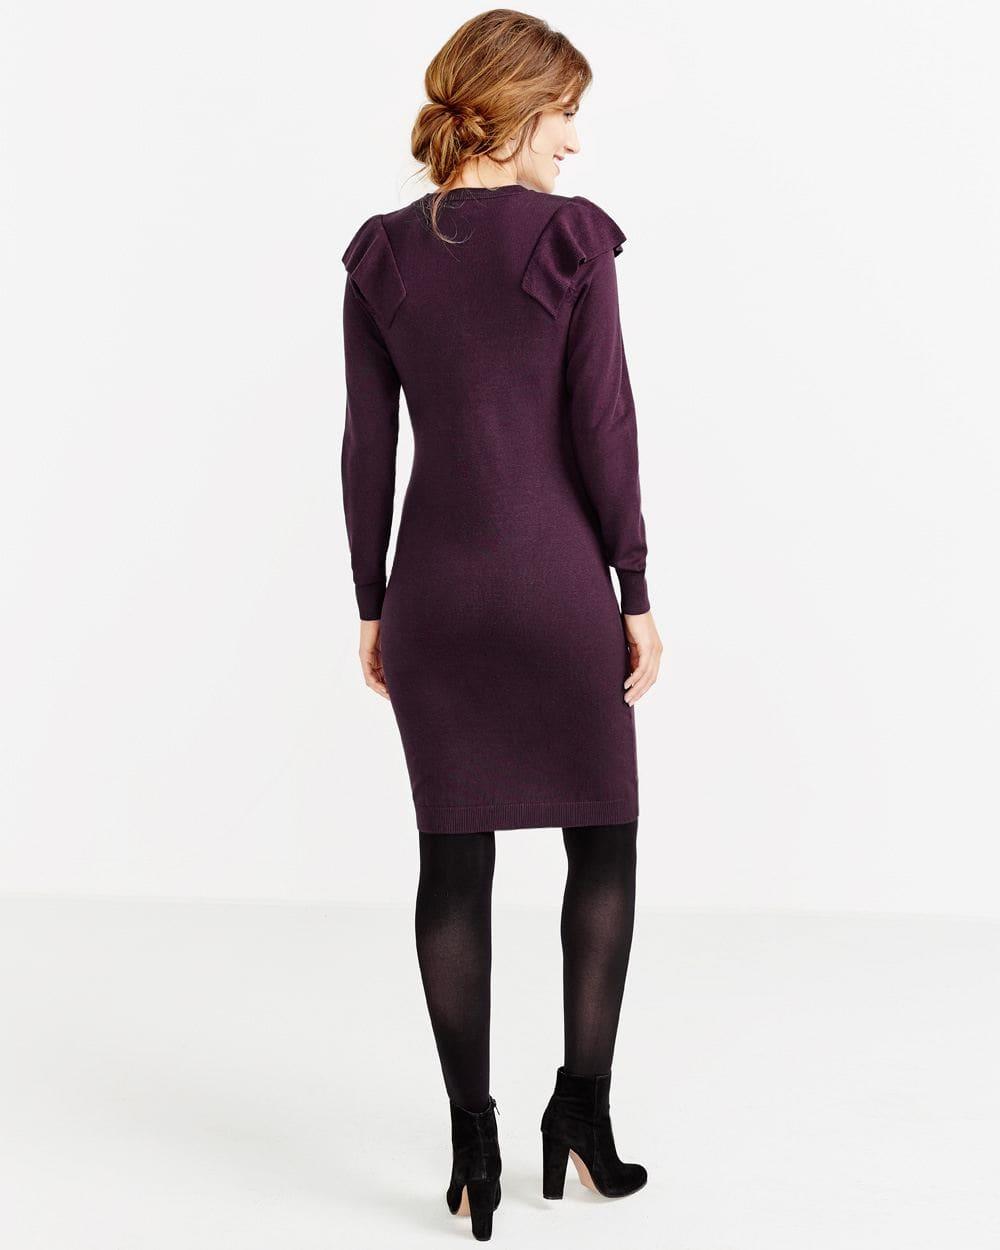 Long Sleeve Ruffle Bodycon Dress